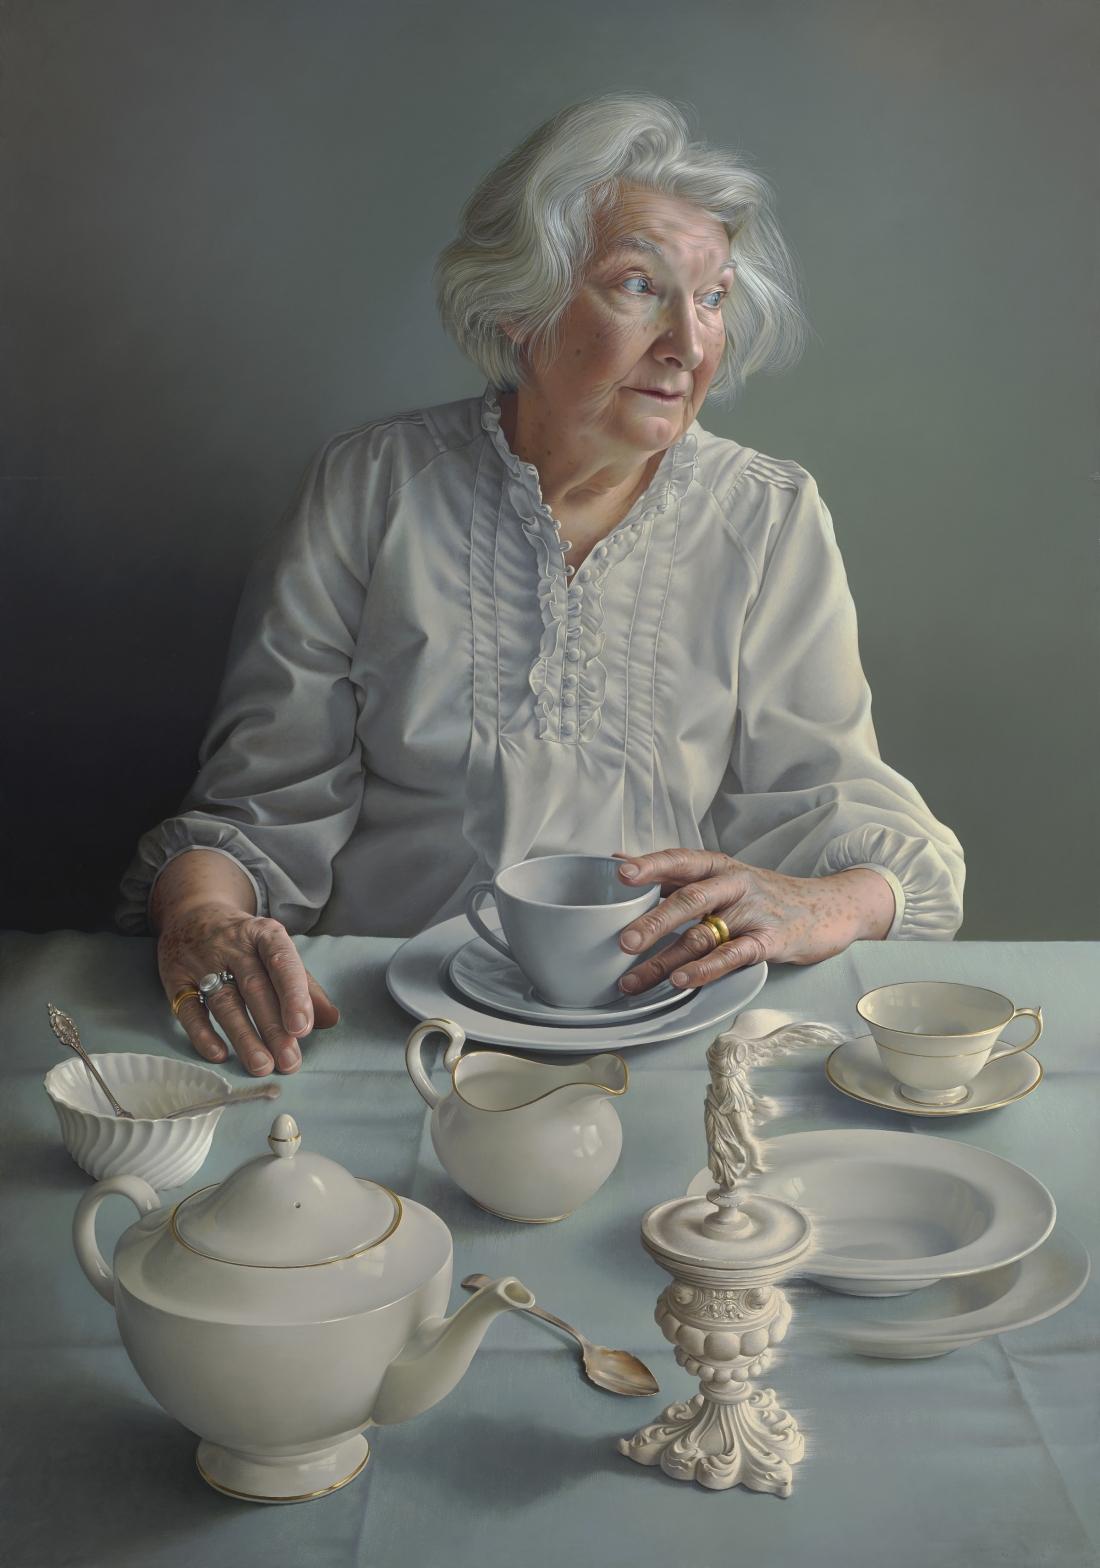 An Angel At My Table by Miriam Escofet, 2017 © Miriam Escofet